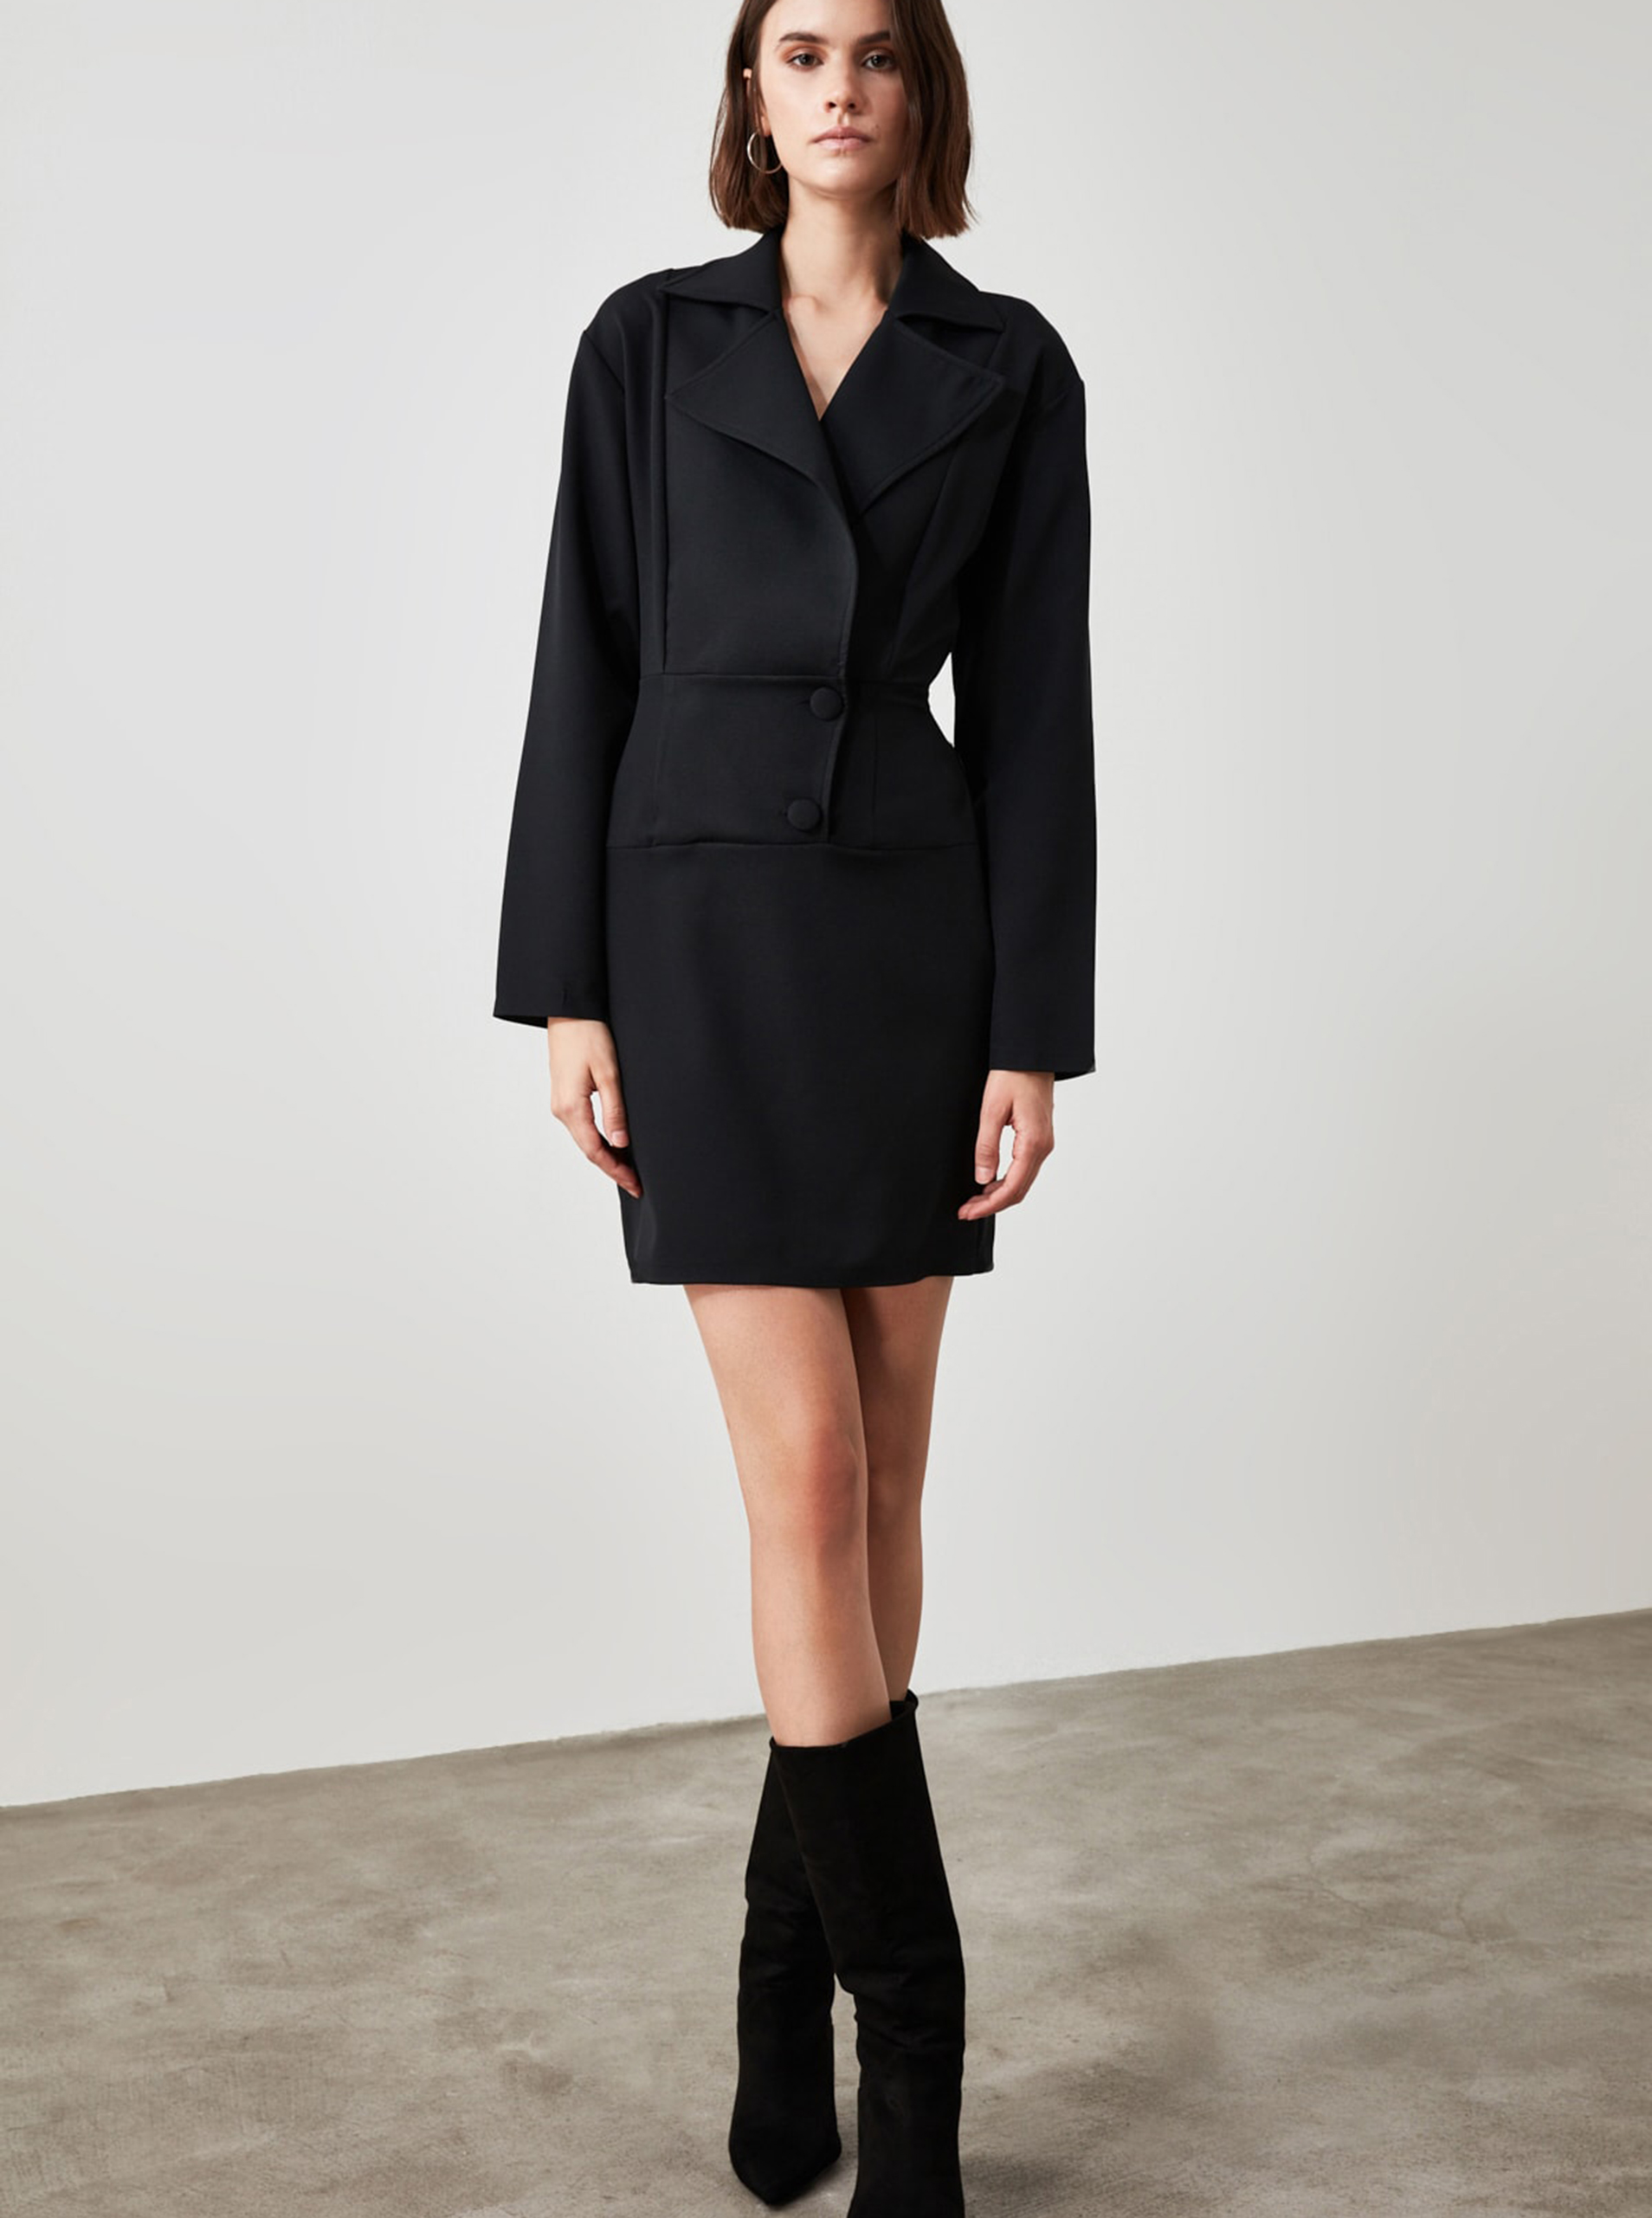 Trendyol black sheath dress